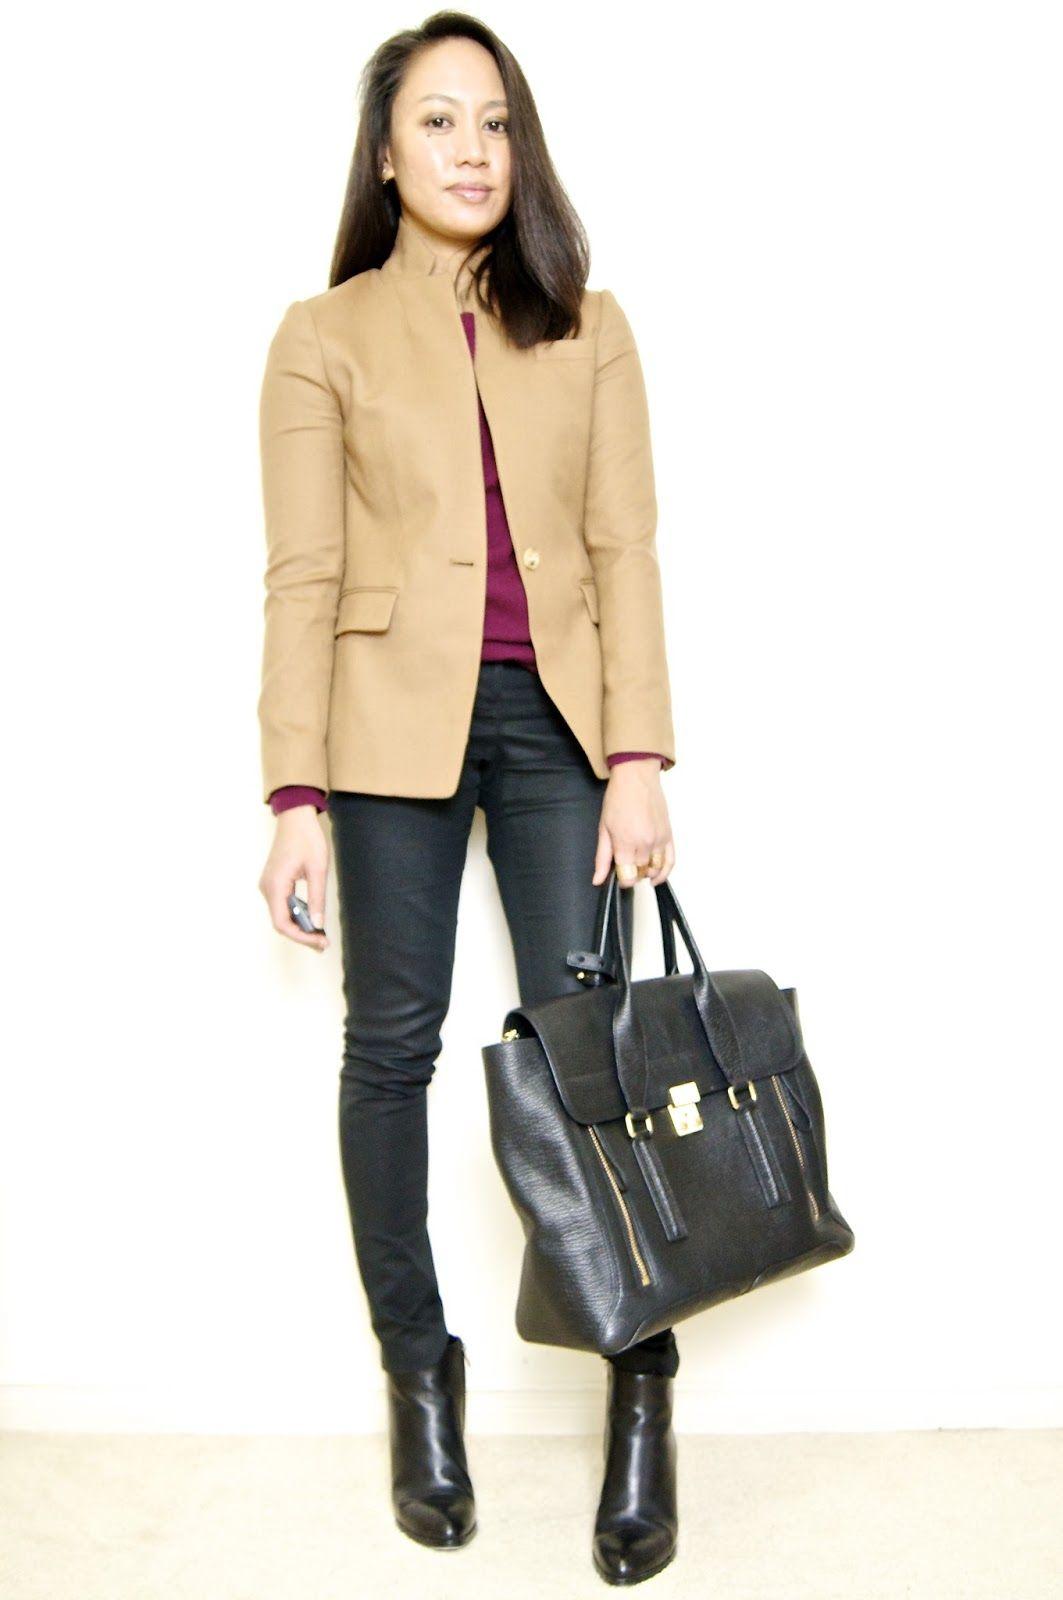 A fashion deliberation - Petite Fashion & Style Blogger/Petite Lookbook.  Re-pin via petitestyleonline.com